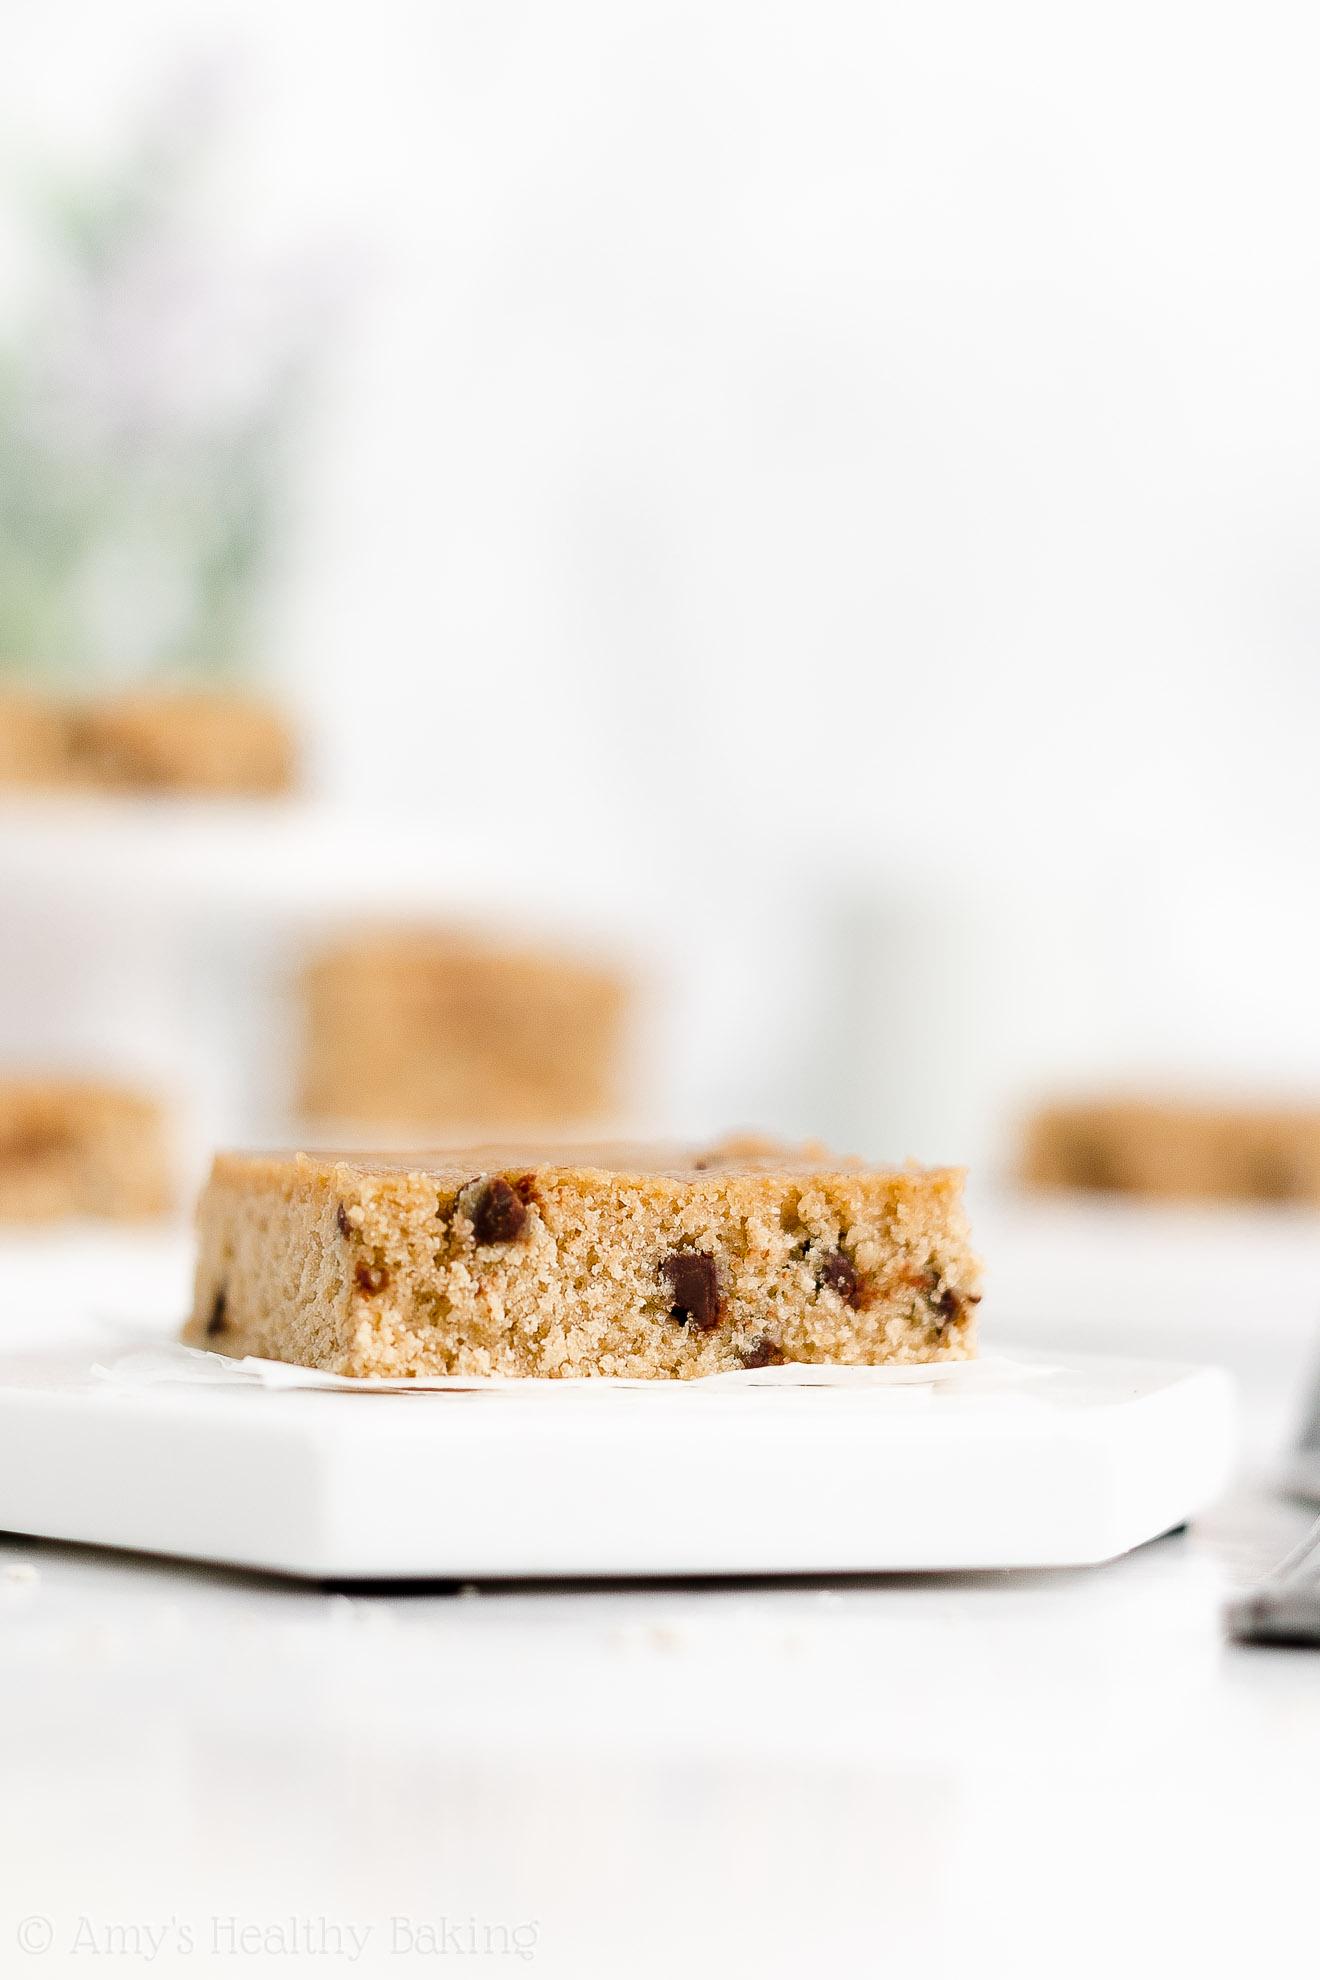 Best Easy Healthy Fudgy Vegan One Bowl Flourless Chocolate Chip Blondies